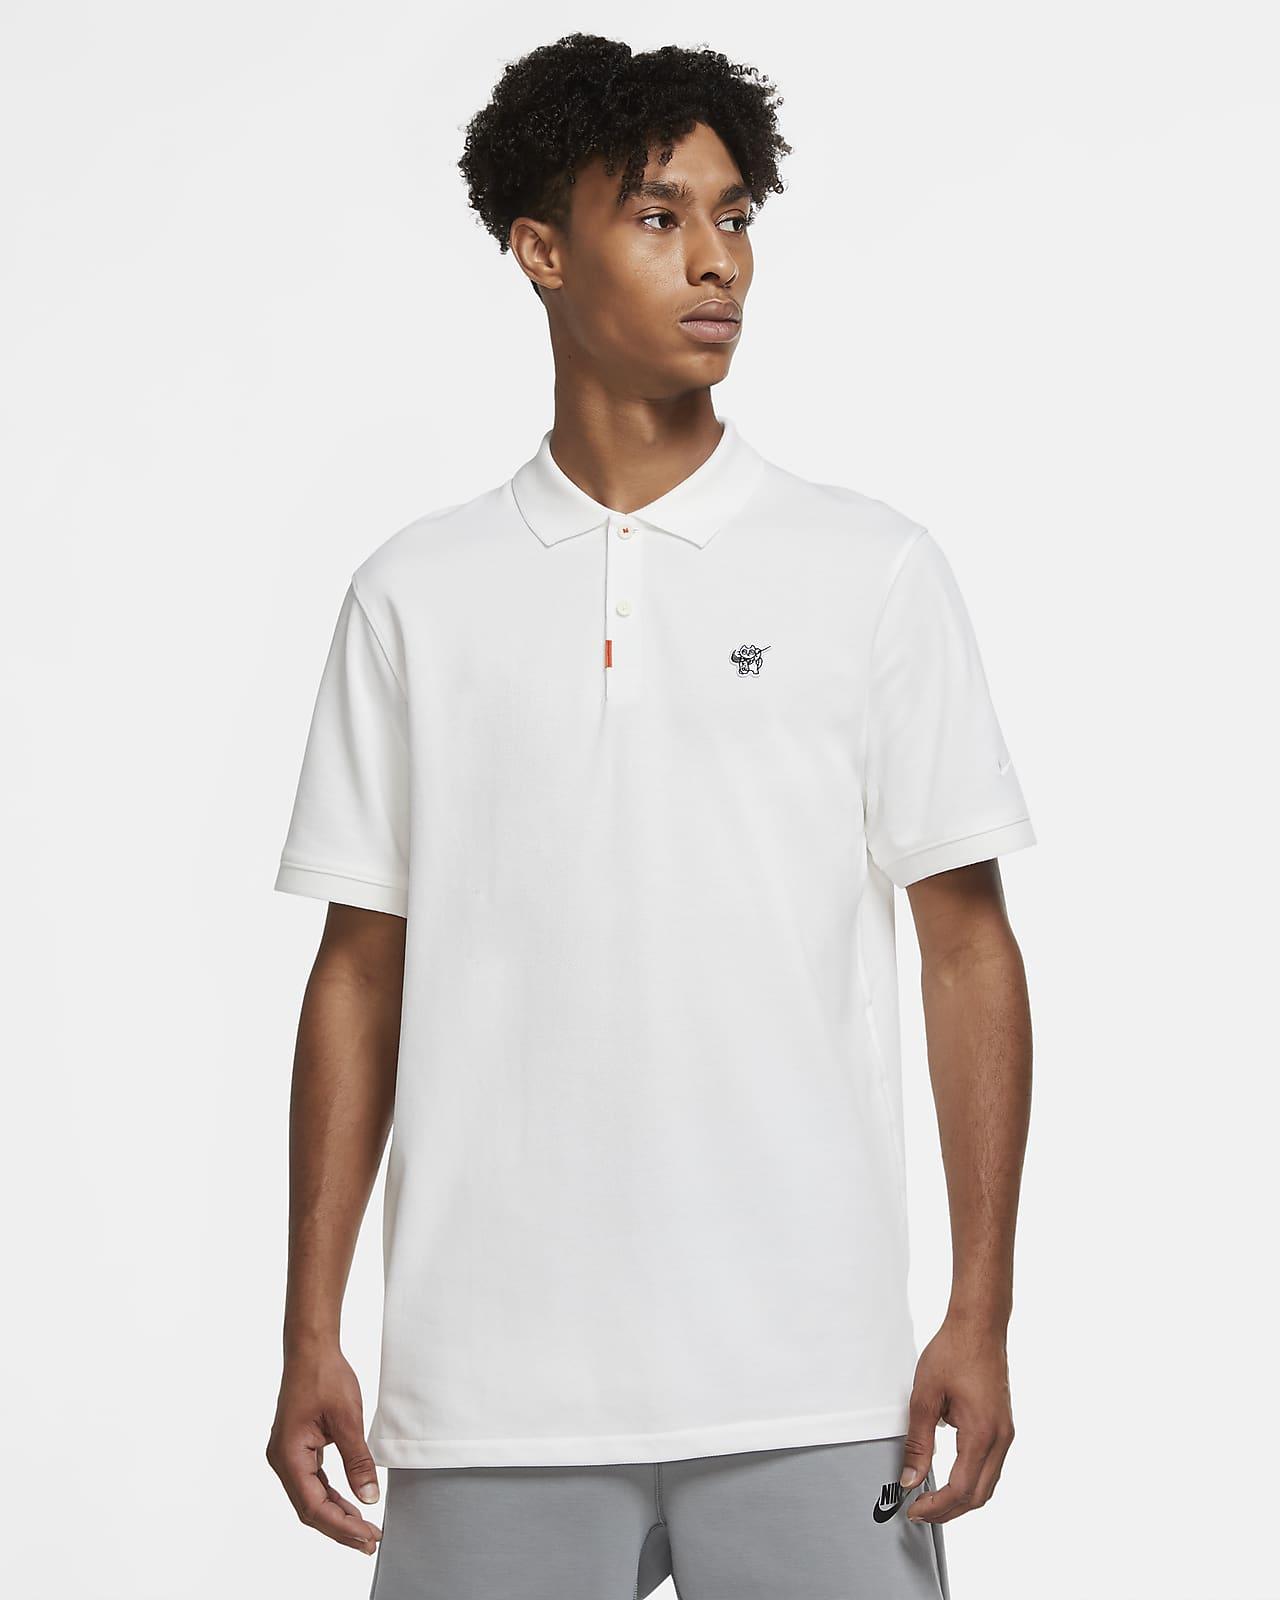 Polo coupe slim The Nike Polo Naomi Osaka mixte